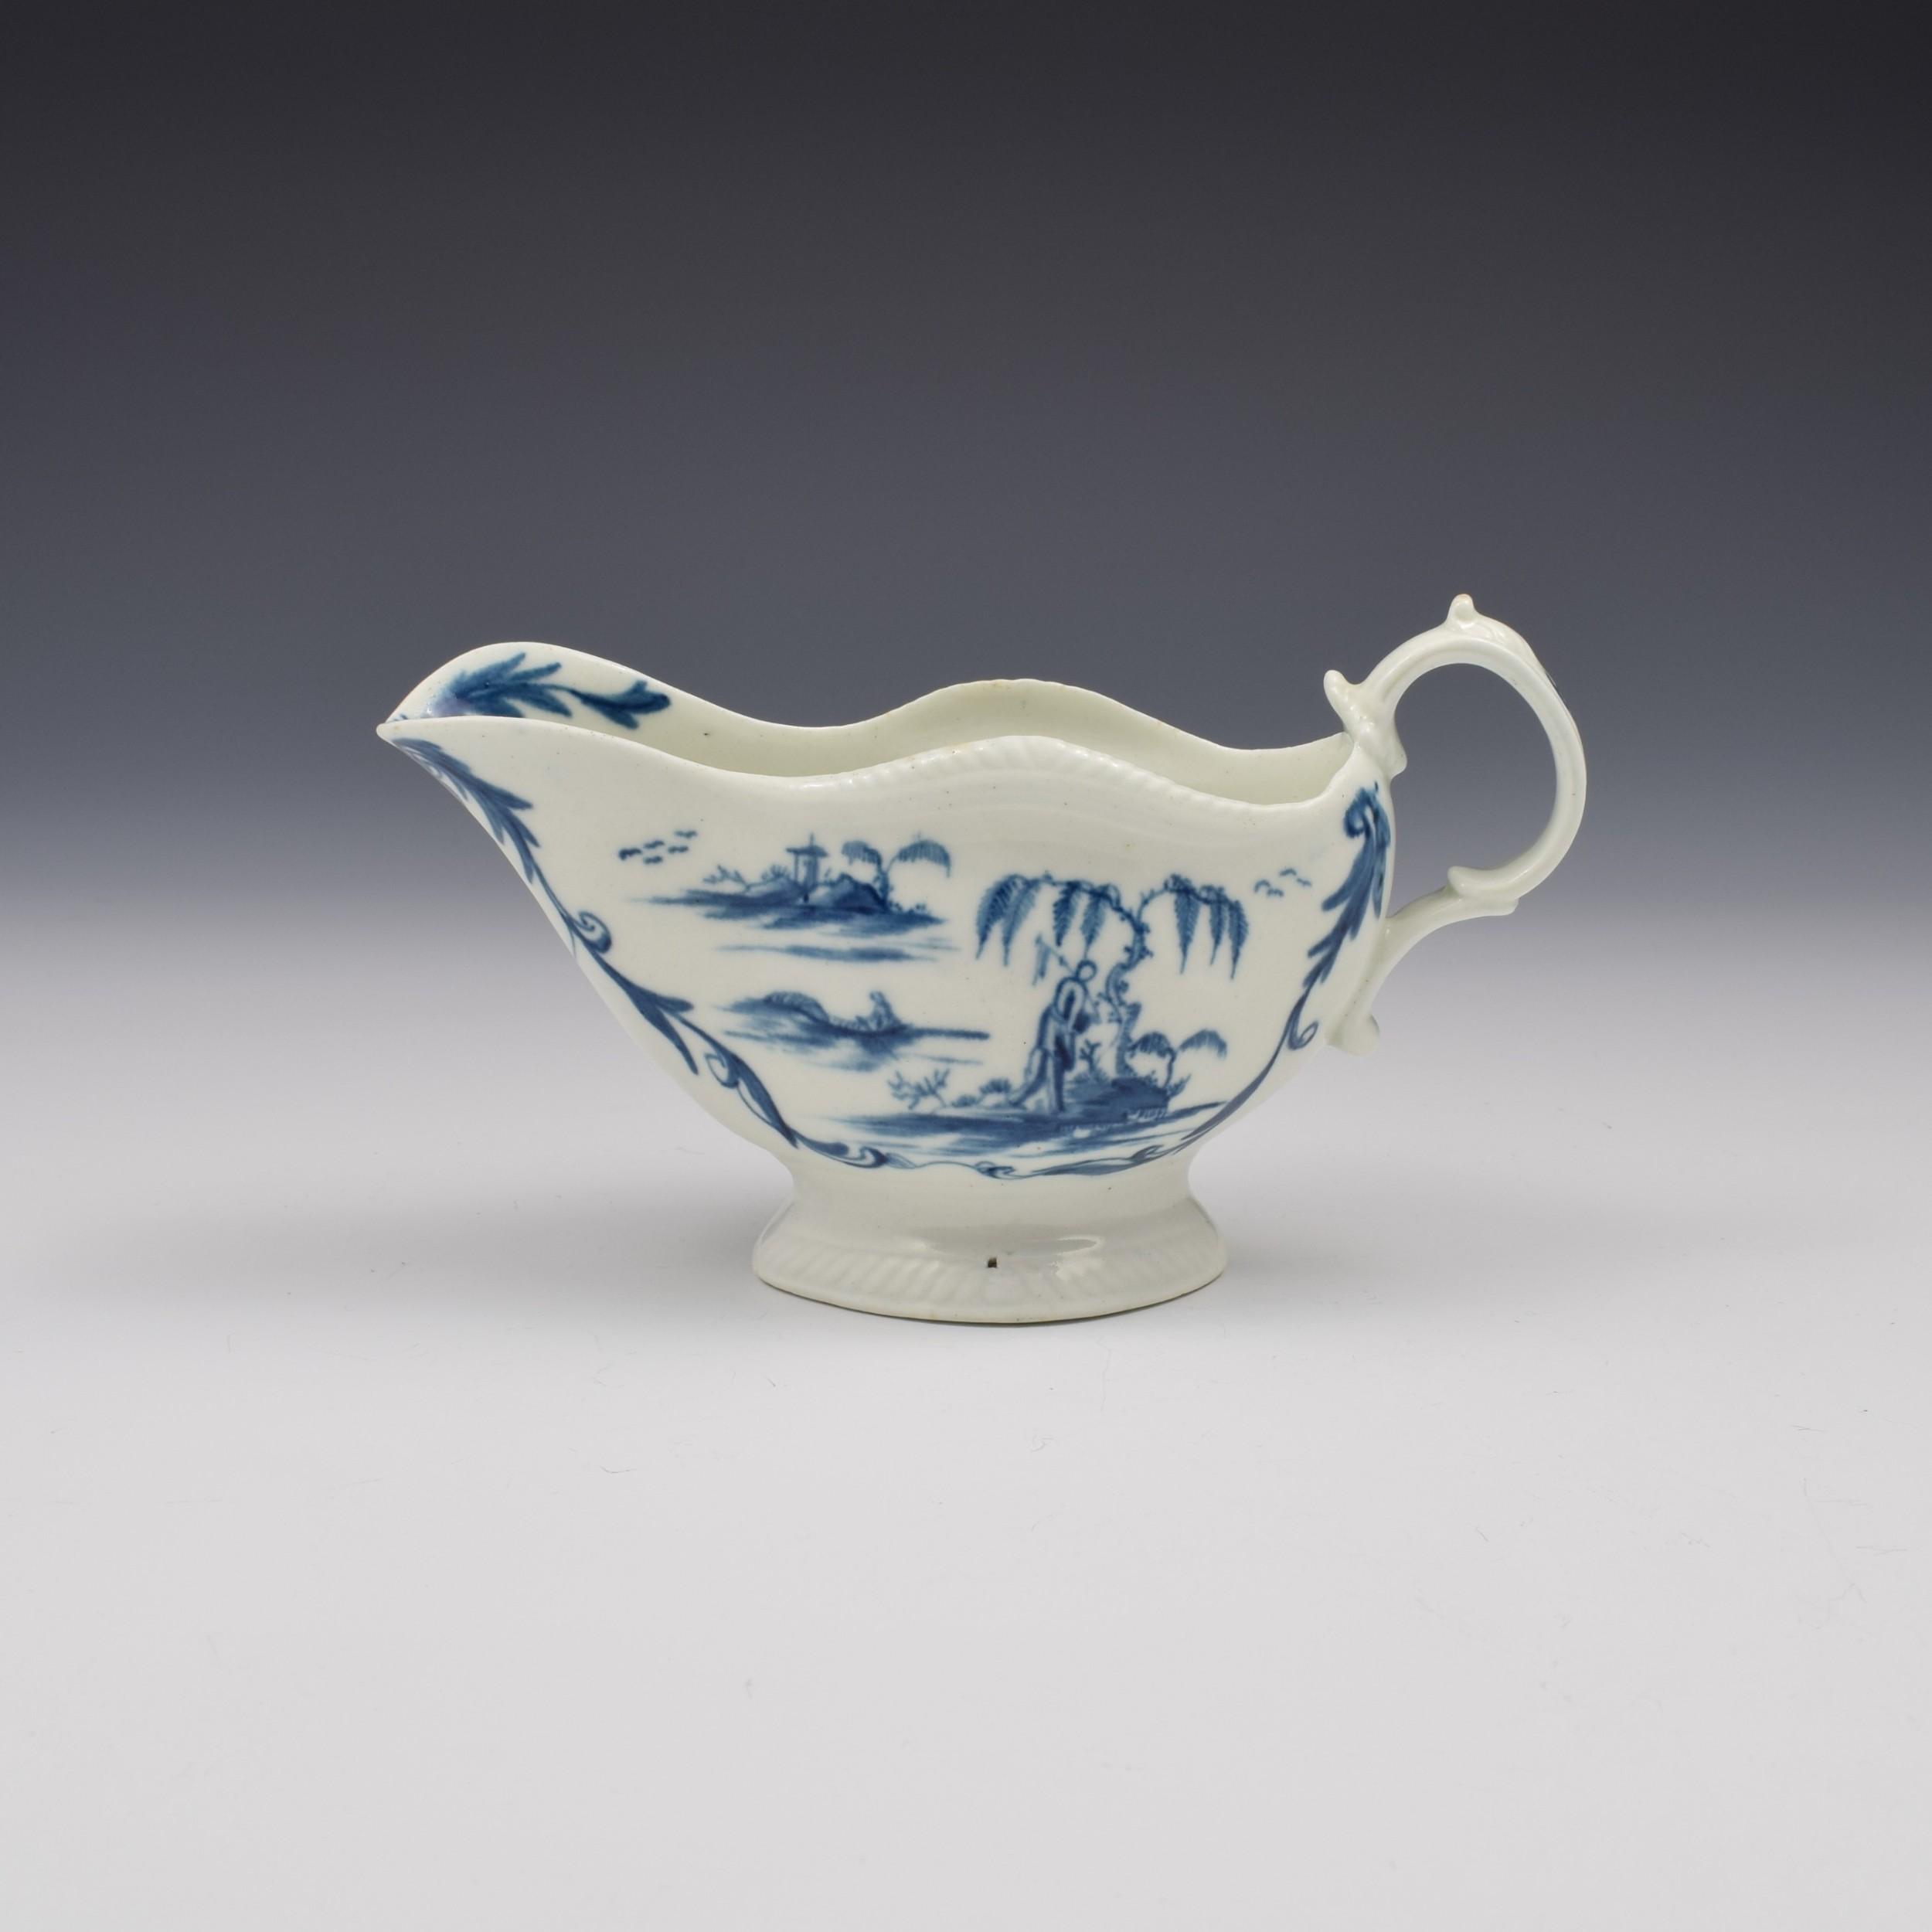 rare first period worcester porcelain one porter landscape pattern sauce boat c1765